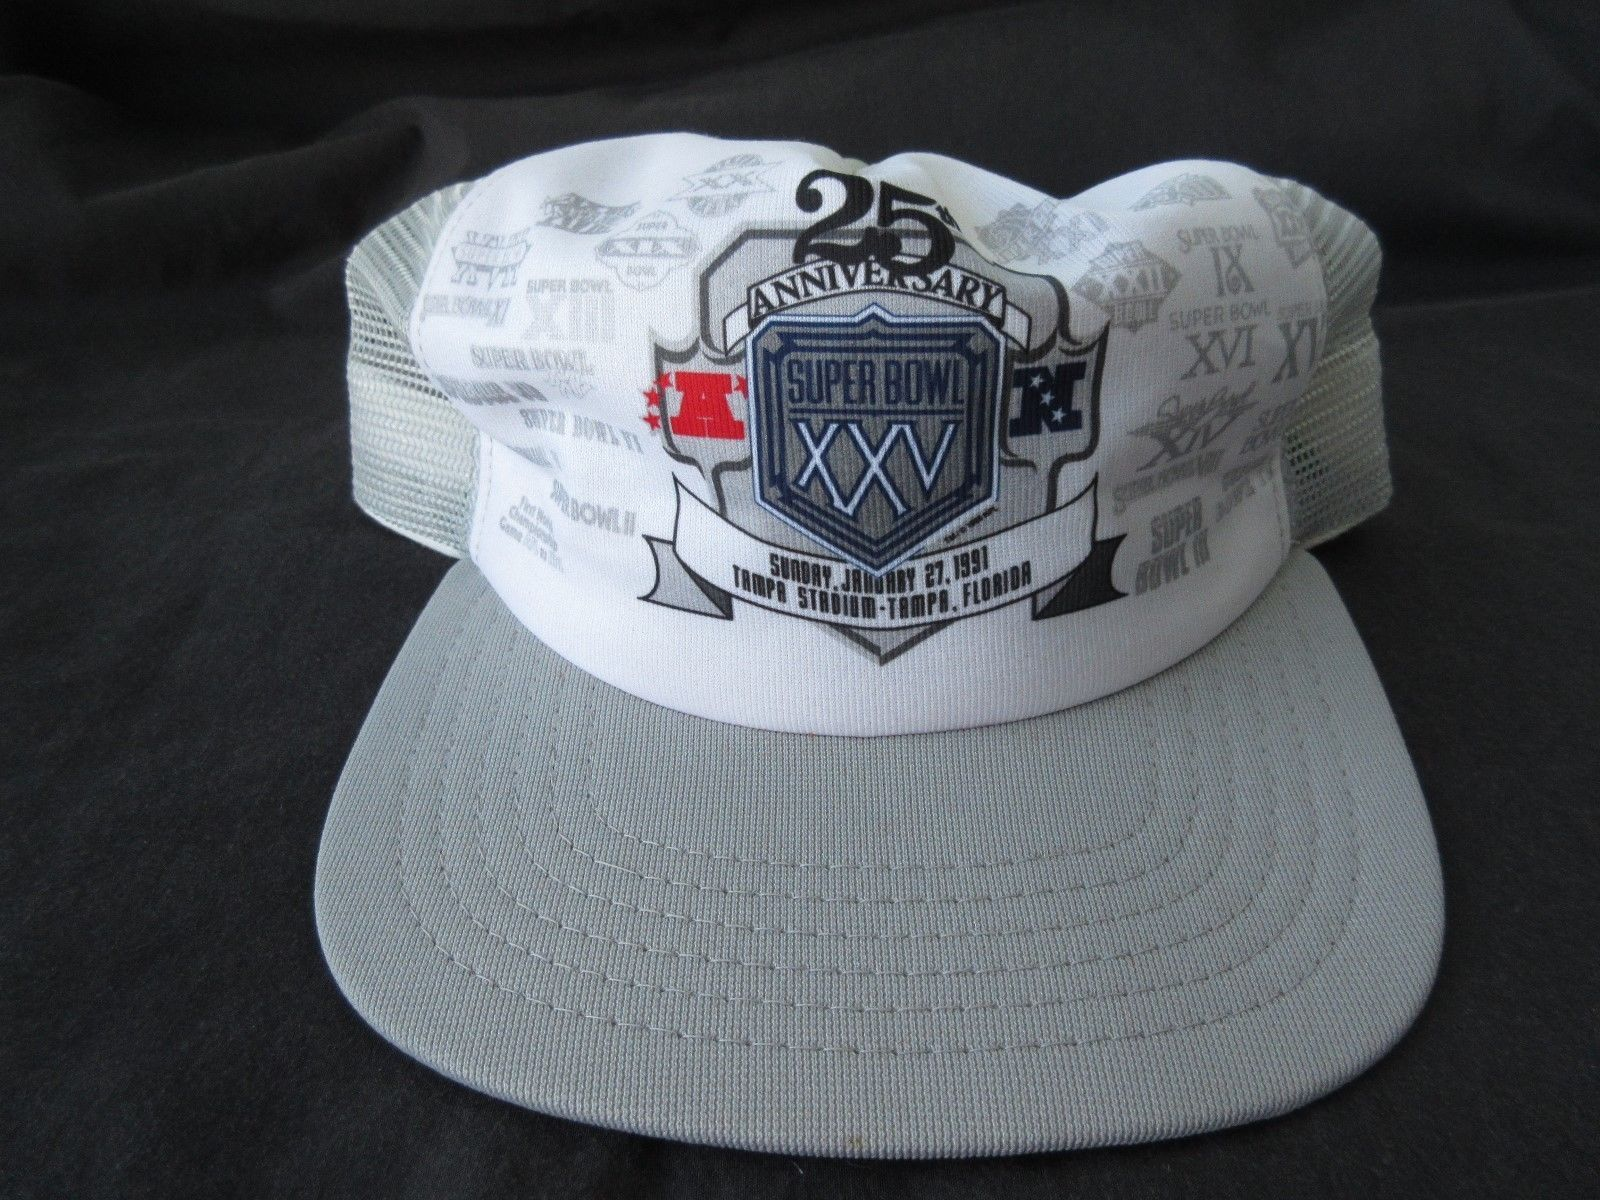 dec961e6 Vintage 1991 Super Bowl XXV 25 Trucker Hat and 13 similar items. 57